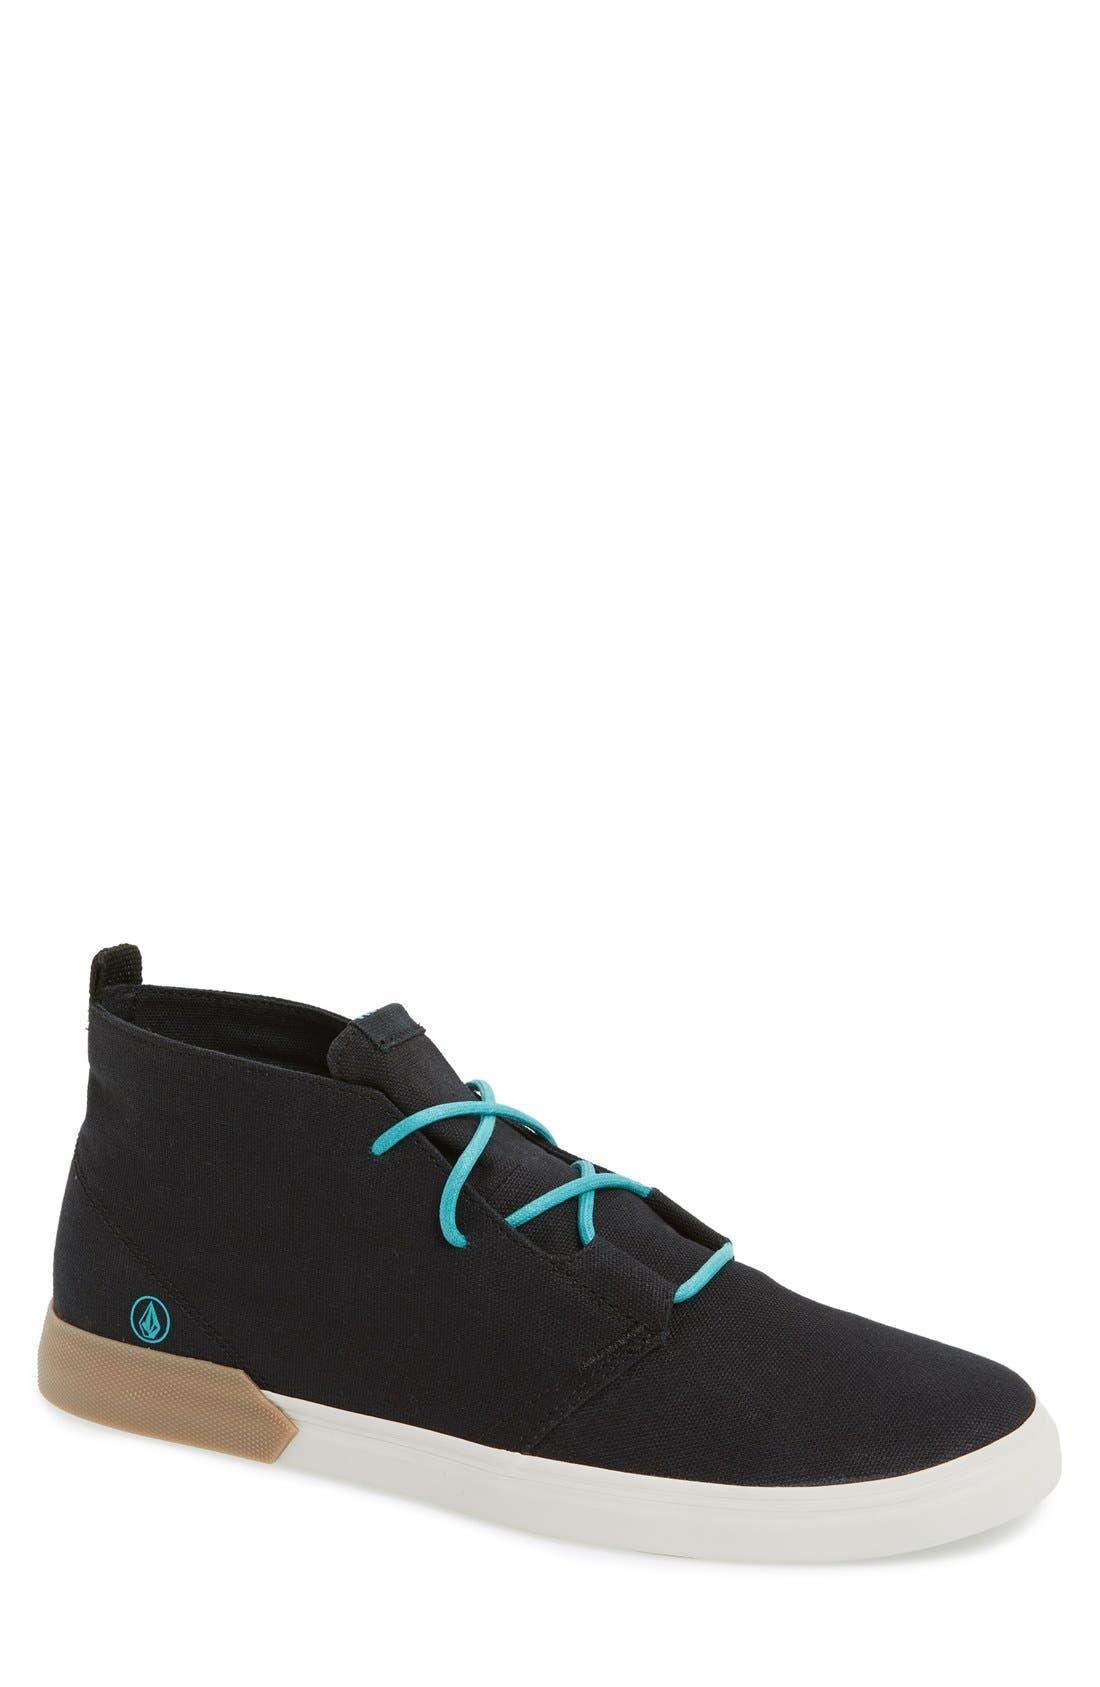 Alternate Image 1 Selected - Volcom 'De Fray' High Top Sneaker